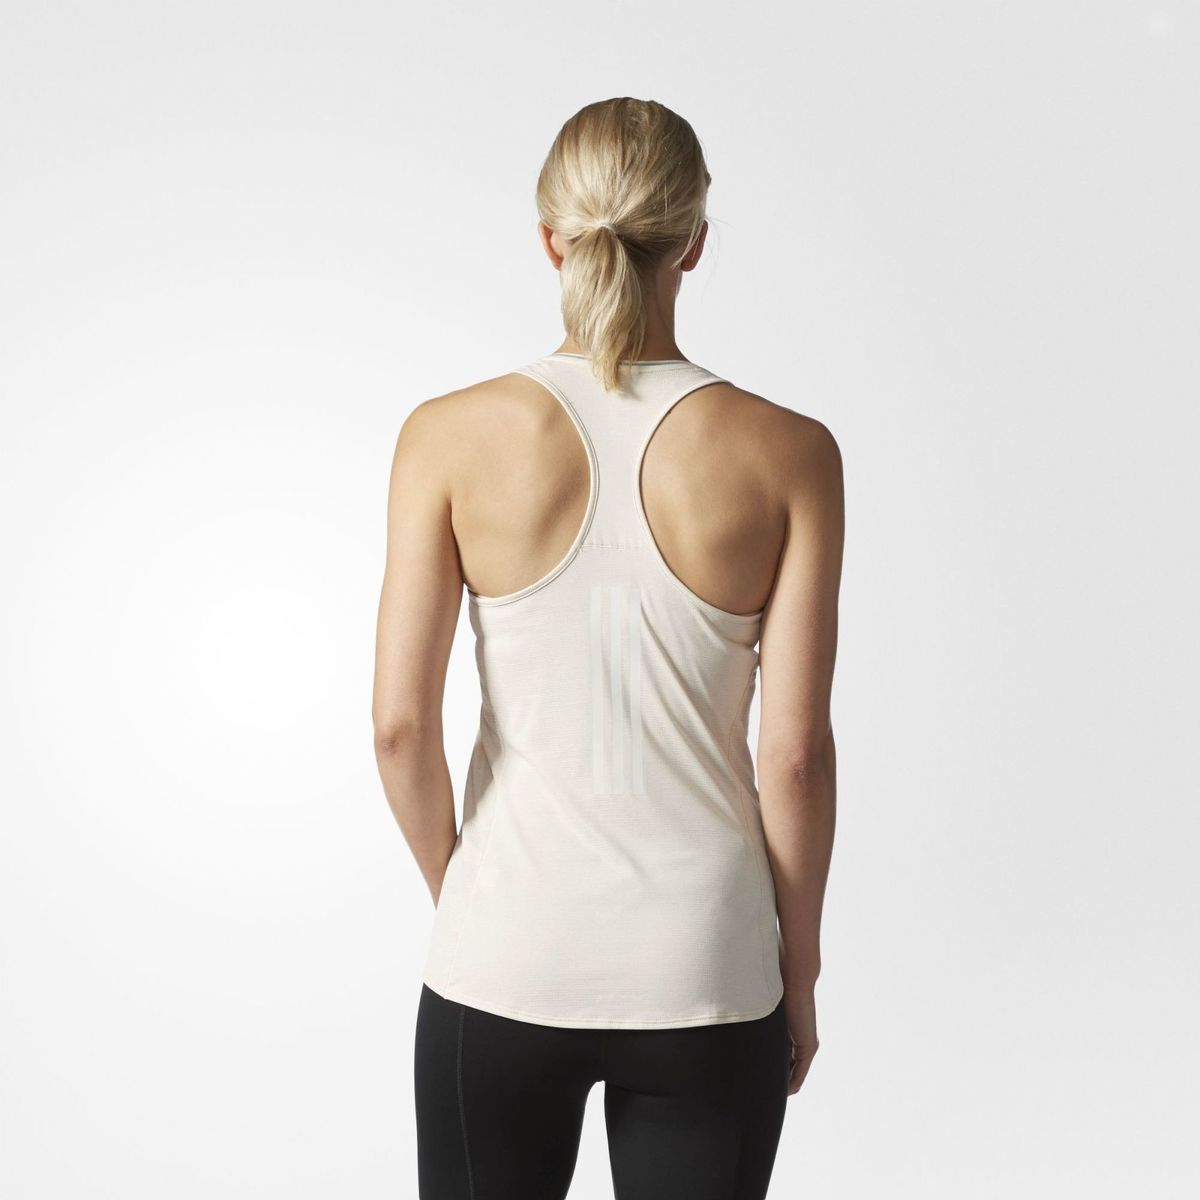 adidas, sko, joggesko, treningstøy, treningsklær, aktiv